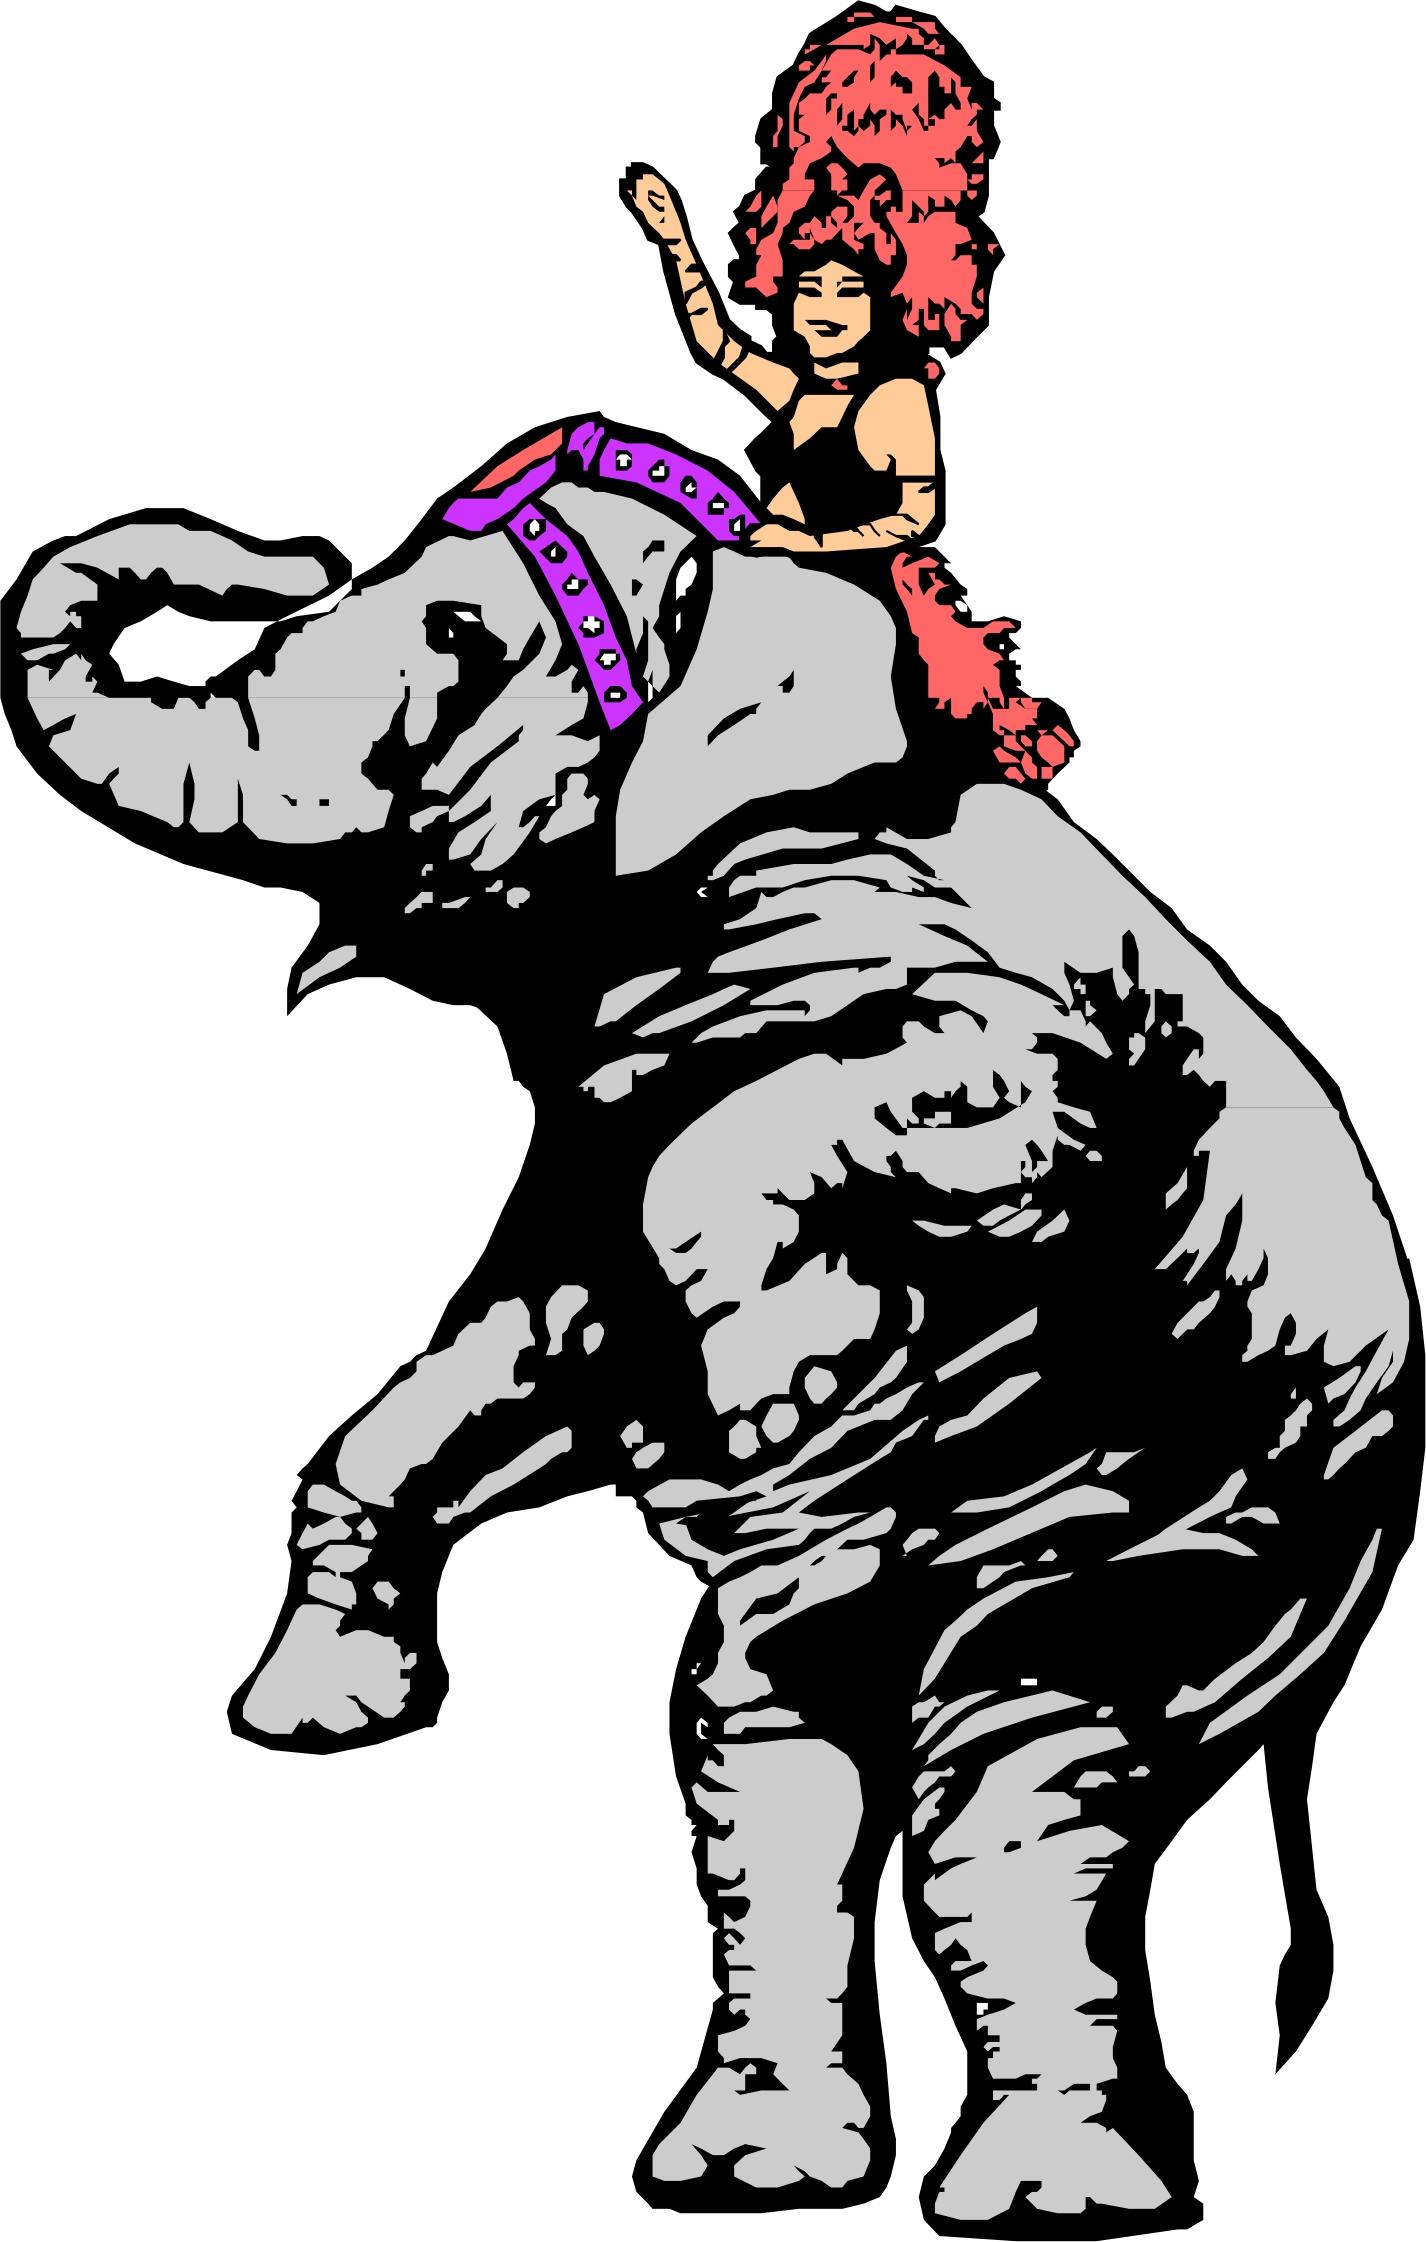 Vintage circus elephant clipart clip art freeuse download Free Circus Elephant Cliparts, Download Free Clip Art, Free ... clip art freeuse download